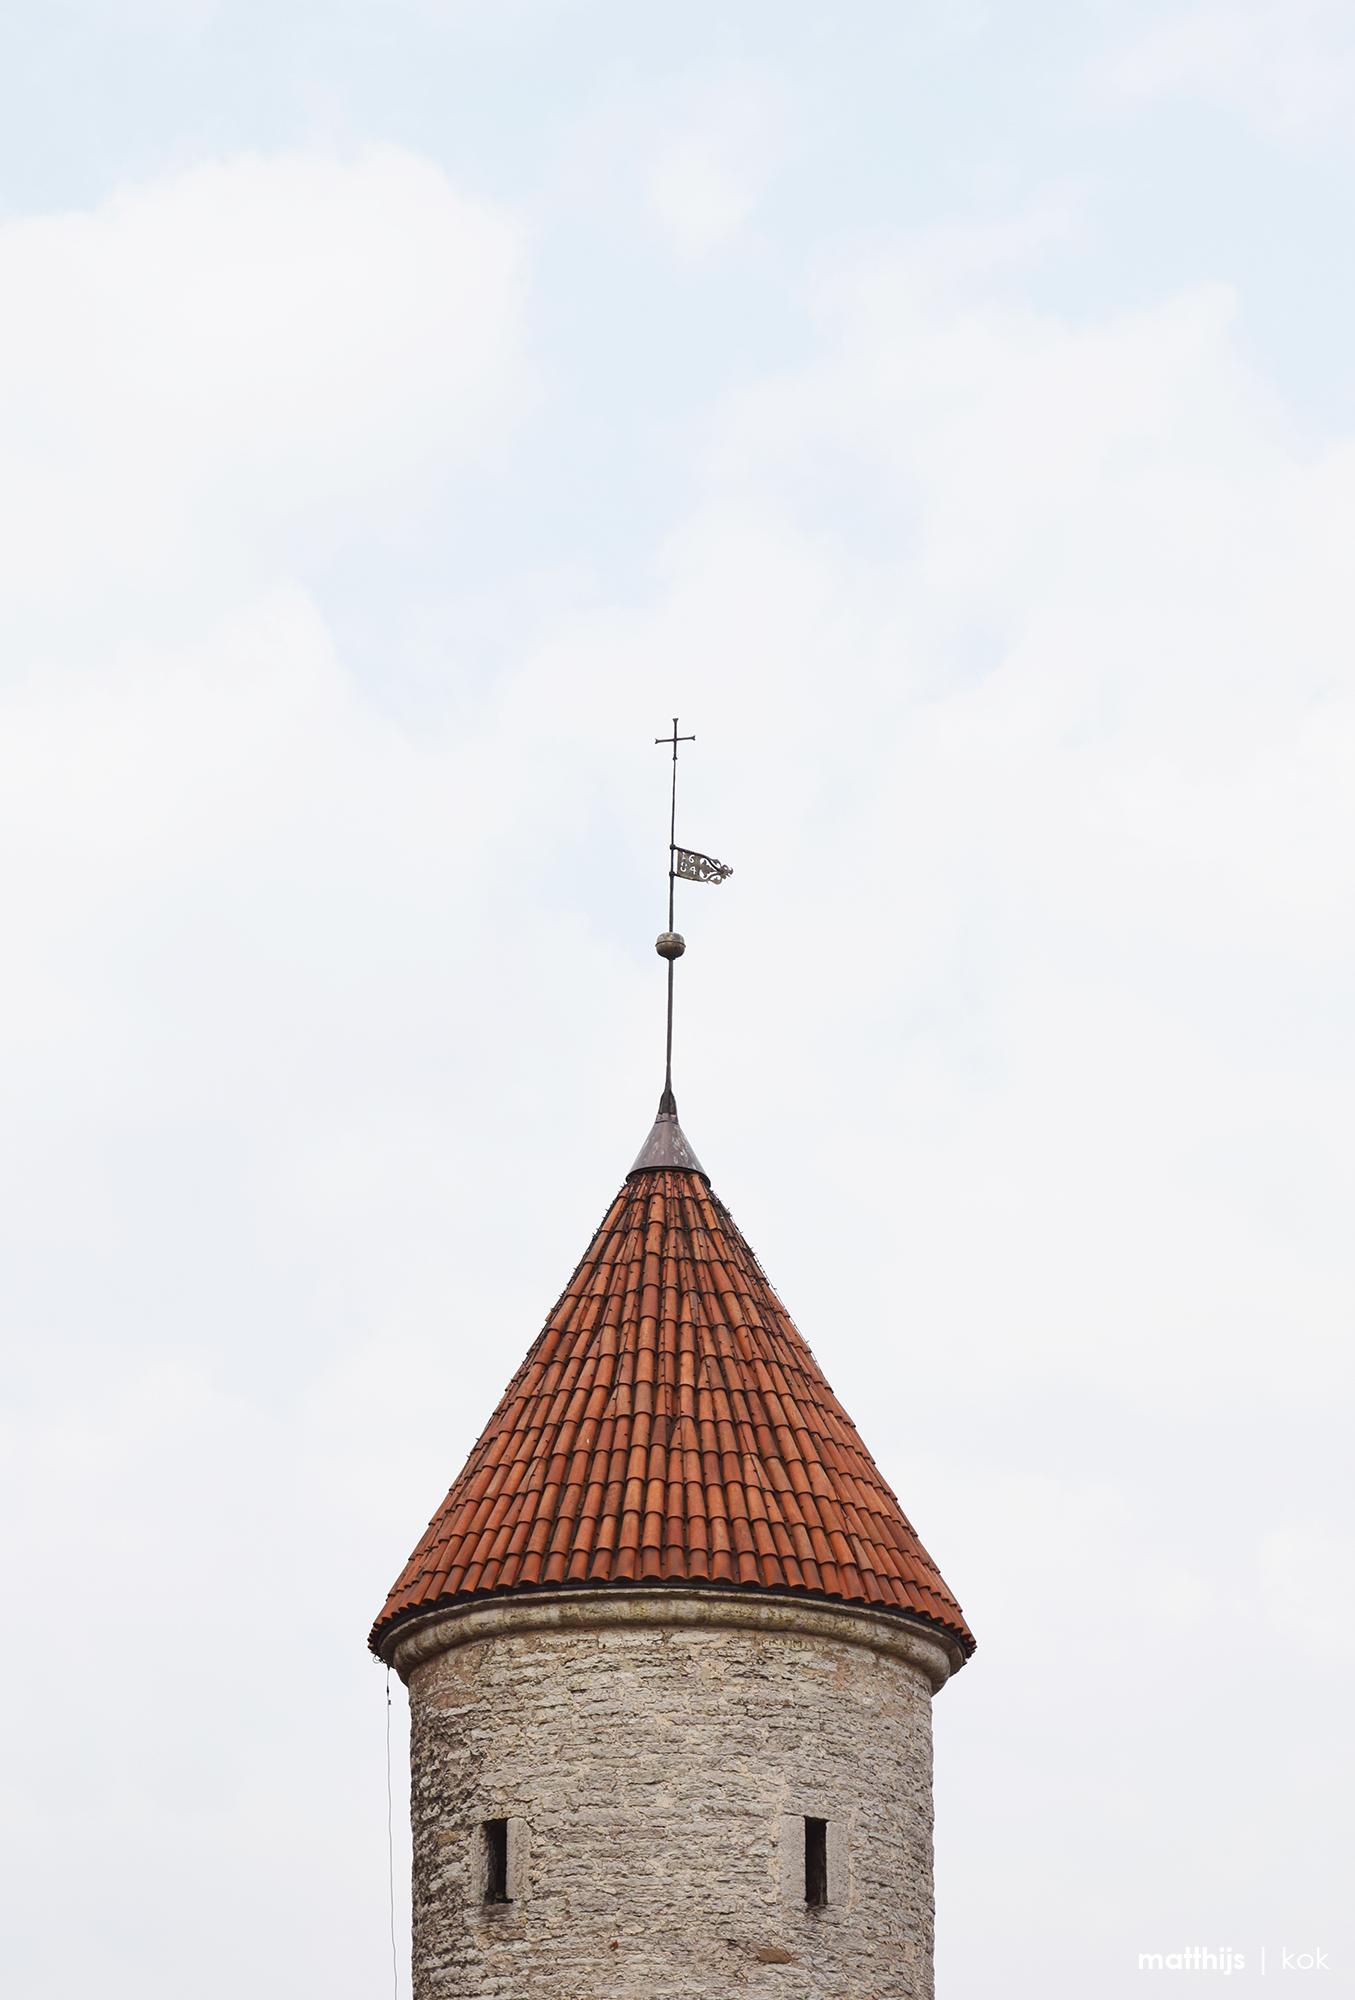 Tallinn City Wall Tower, Estonia   Photo by Matthijs Kok